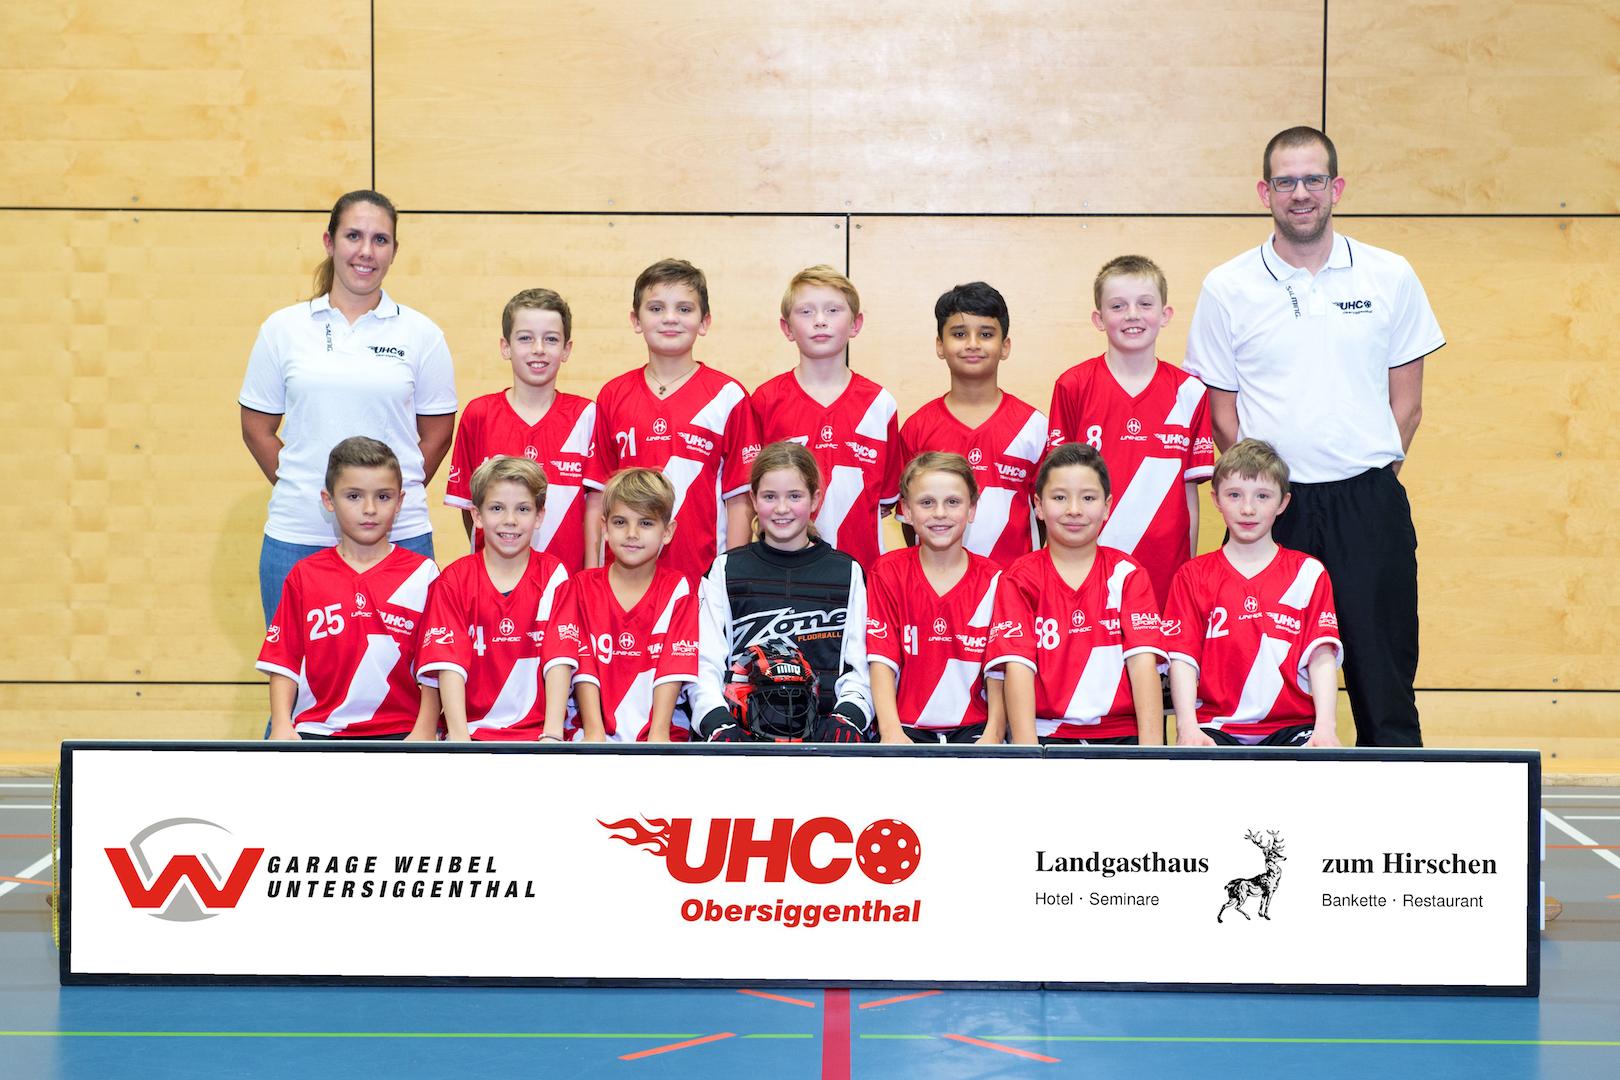 Teamfoto Junioren D2 2017/18